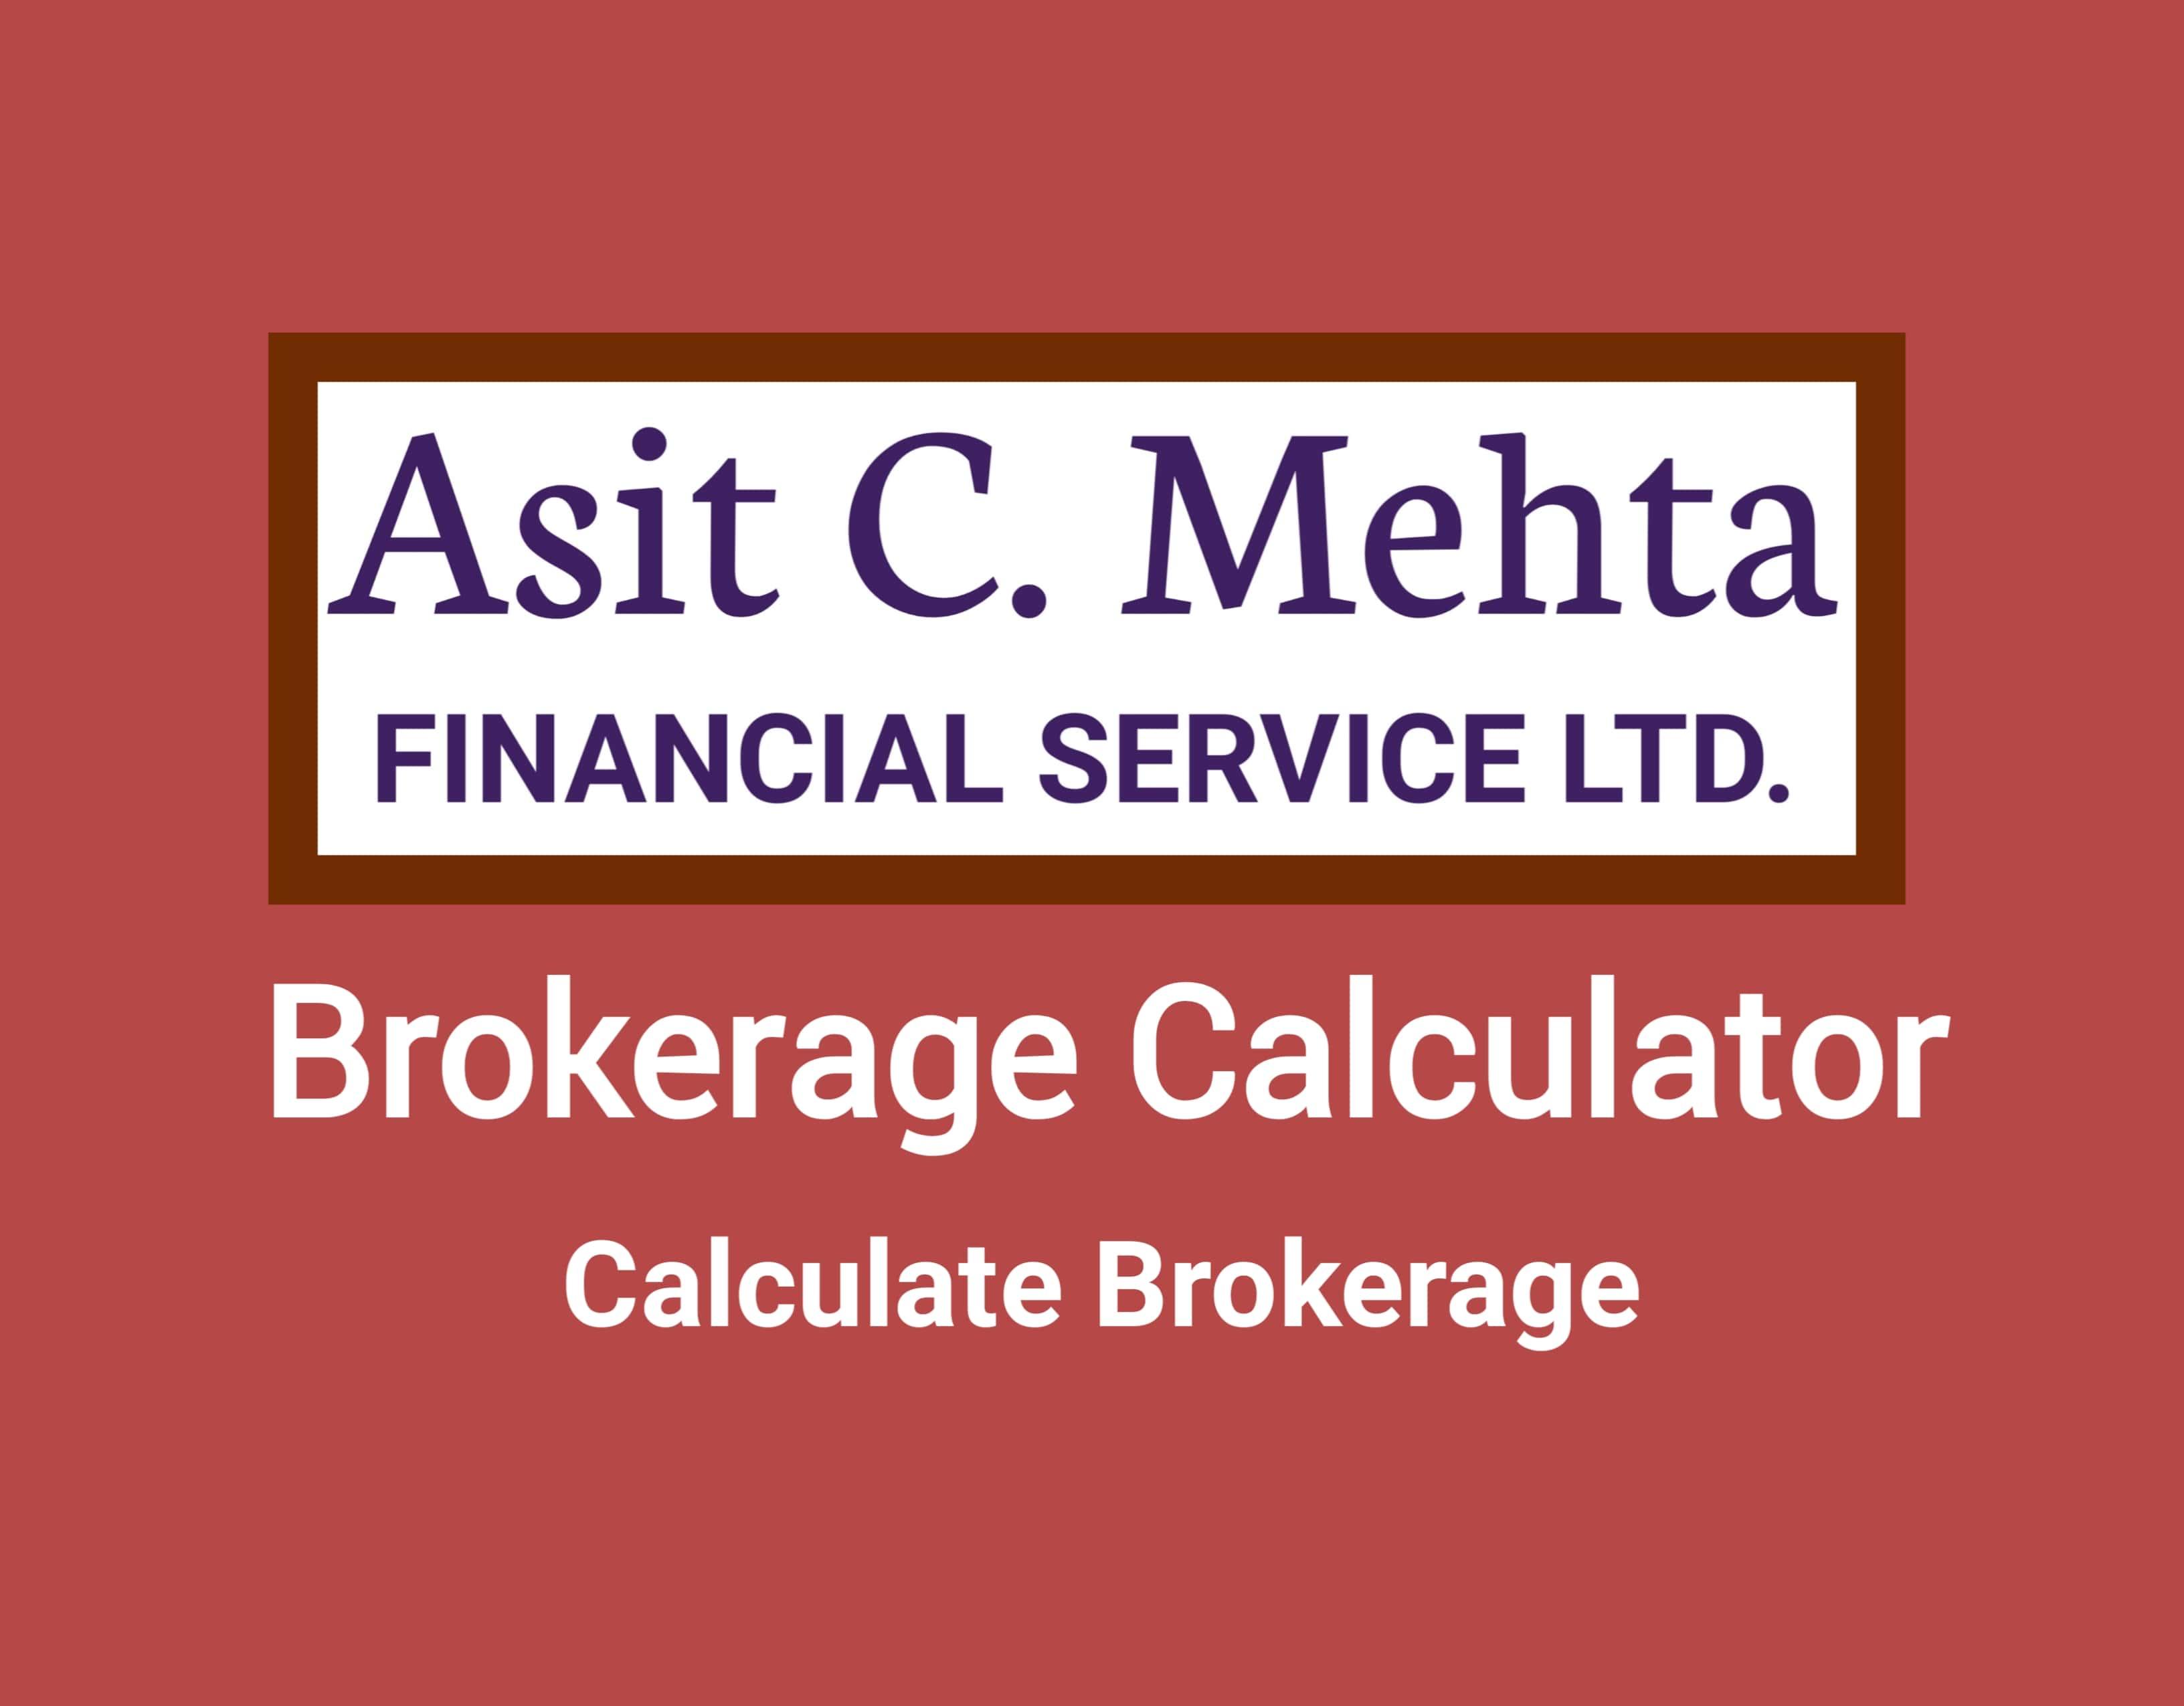 Asit C Mehta Brokerage Calculator